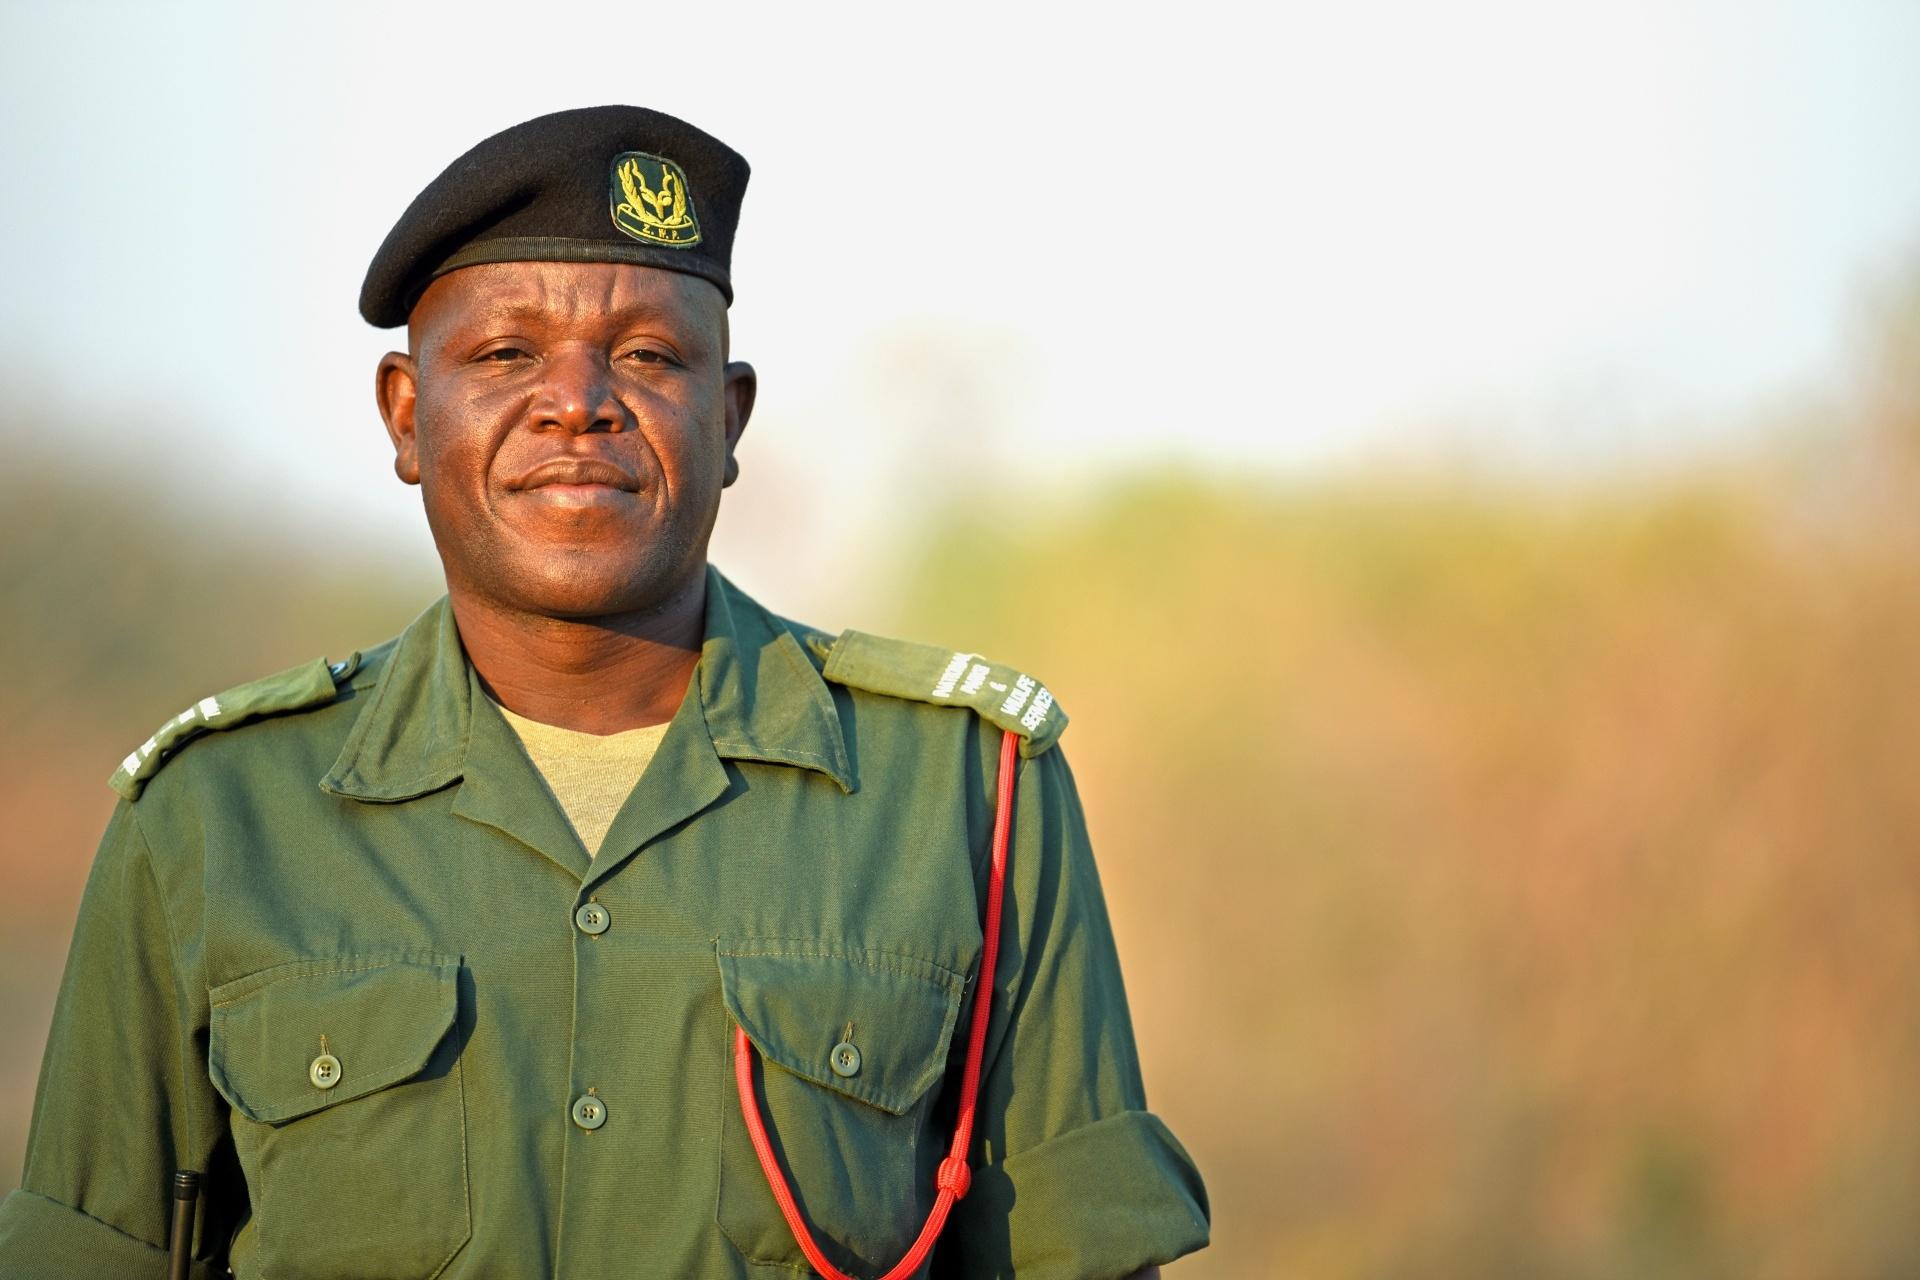 Benson Kanyembo - Tusk Wildlife Ranger Award Winner - (c) Sarah Marshall 2019